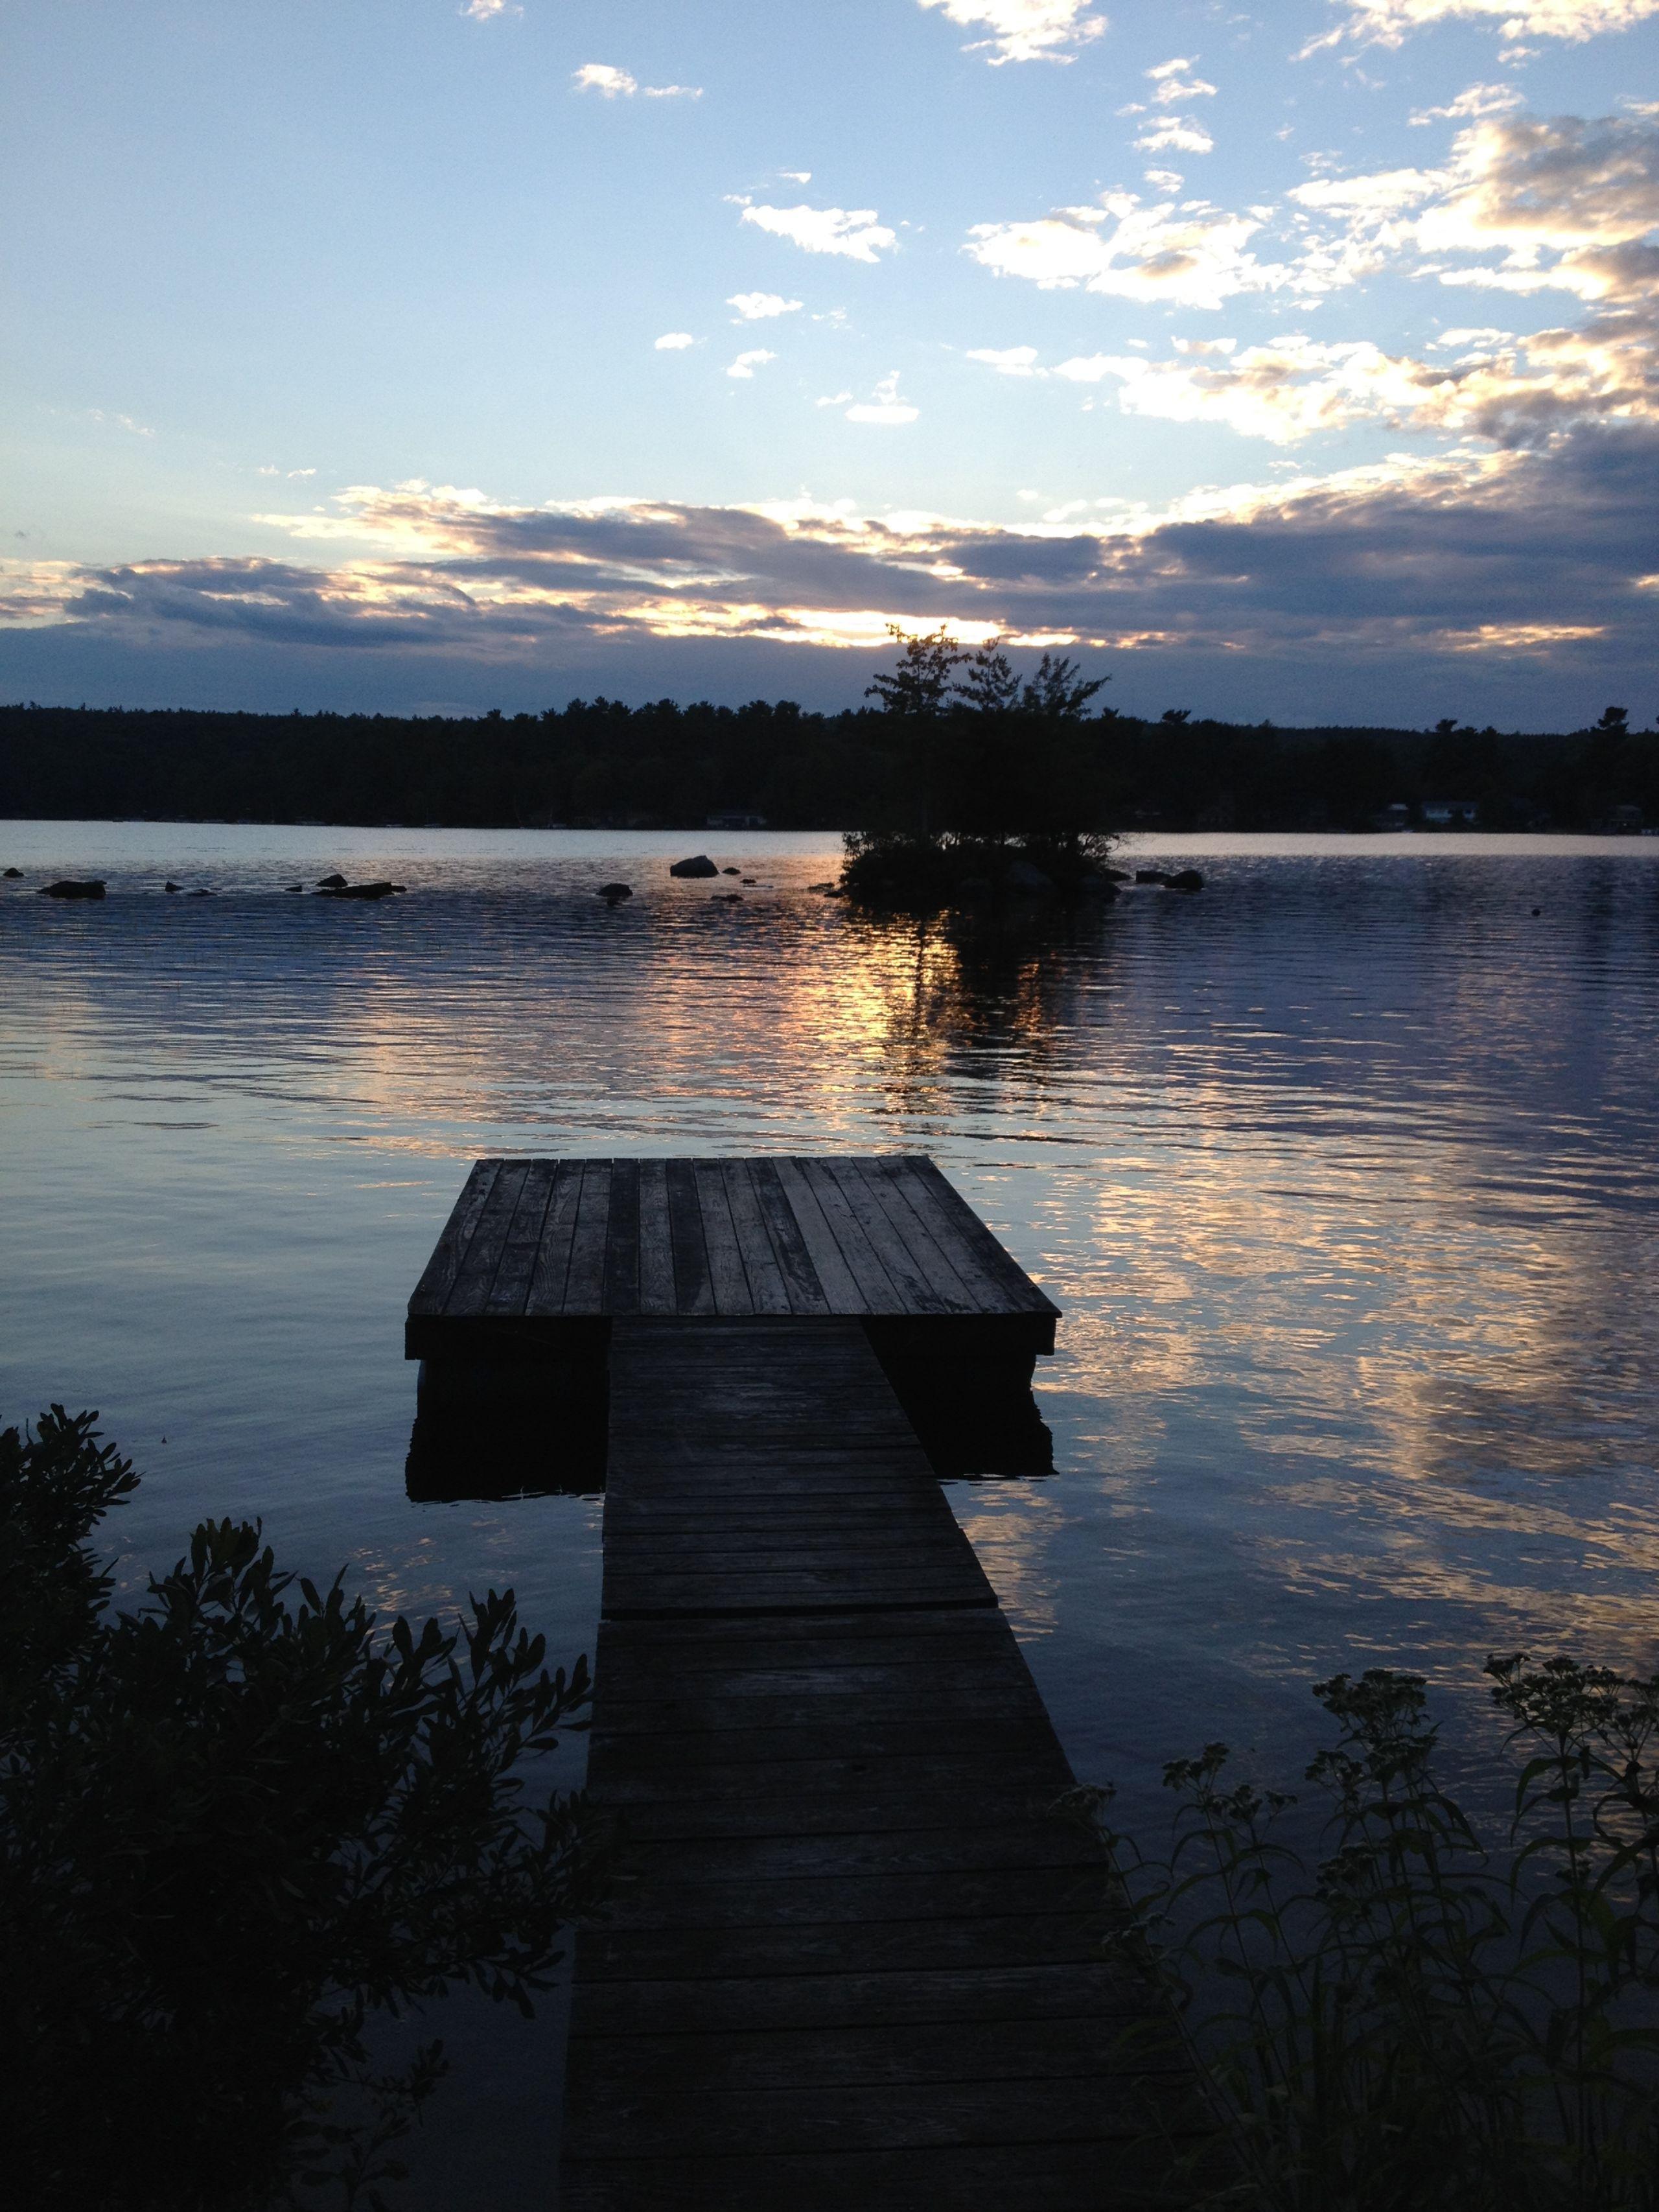 Live on a lake and enjoy all 4 seasons